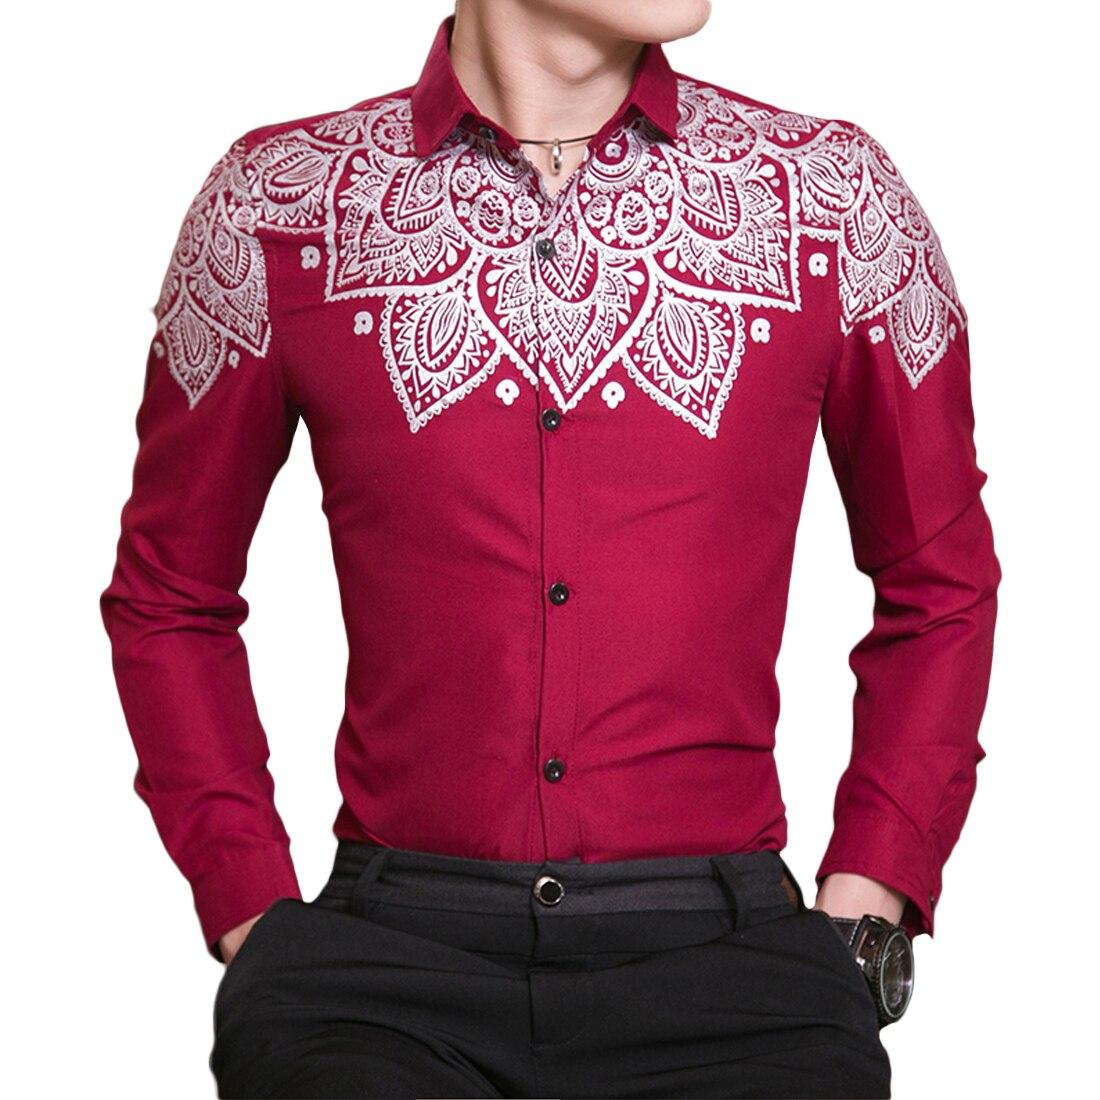 2017 Red Royal Blue Black Casual Wedding shirt men Fashion Print Shirts Gentleman camisas Tops Long Sleeve Shirt Brand clothing